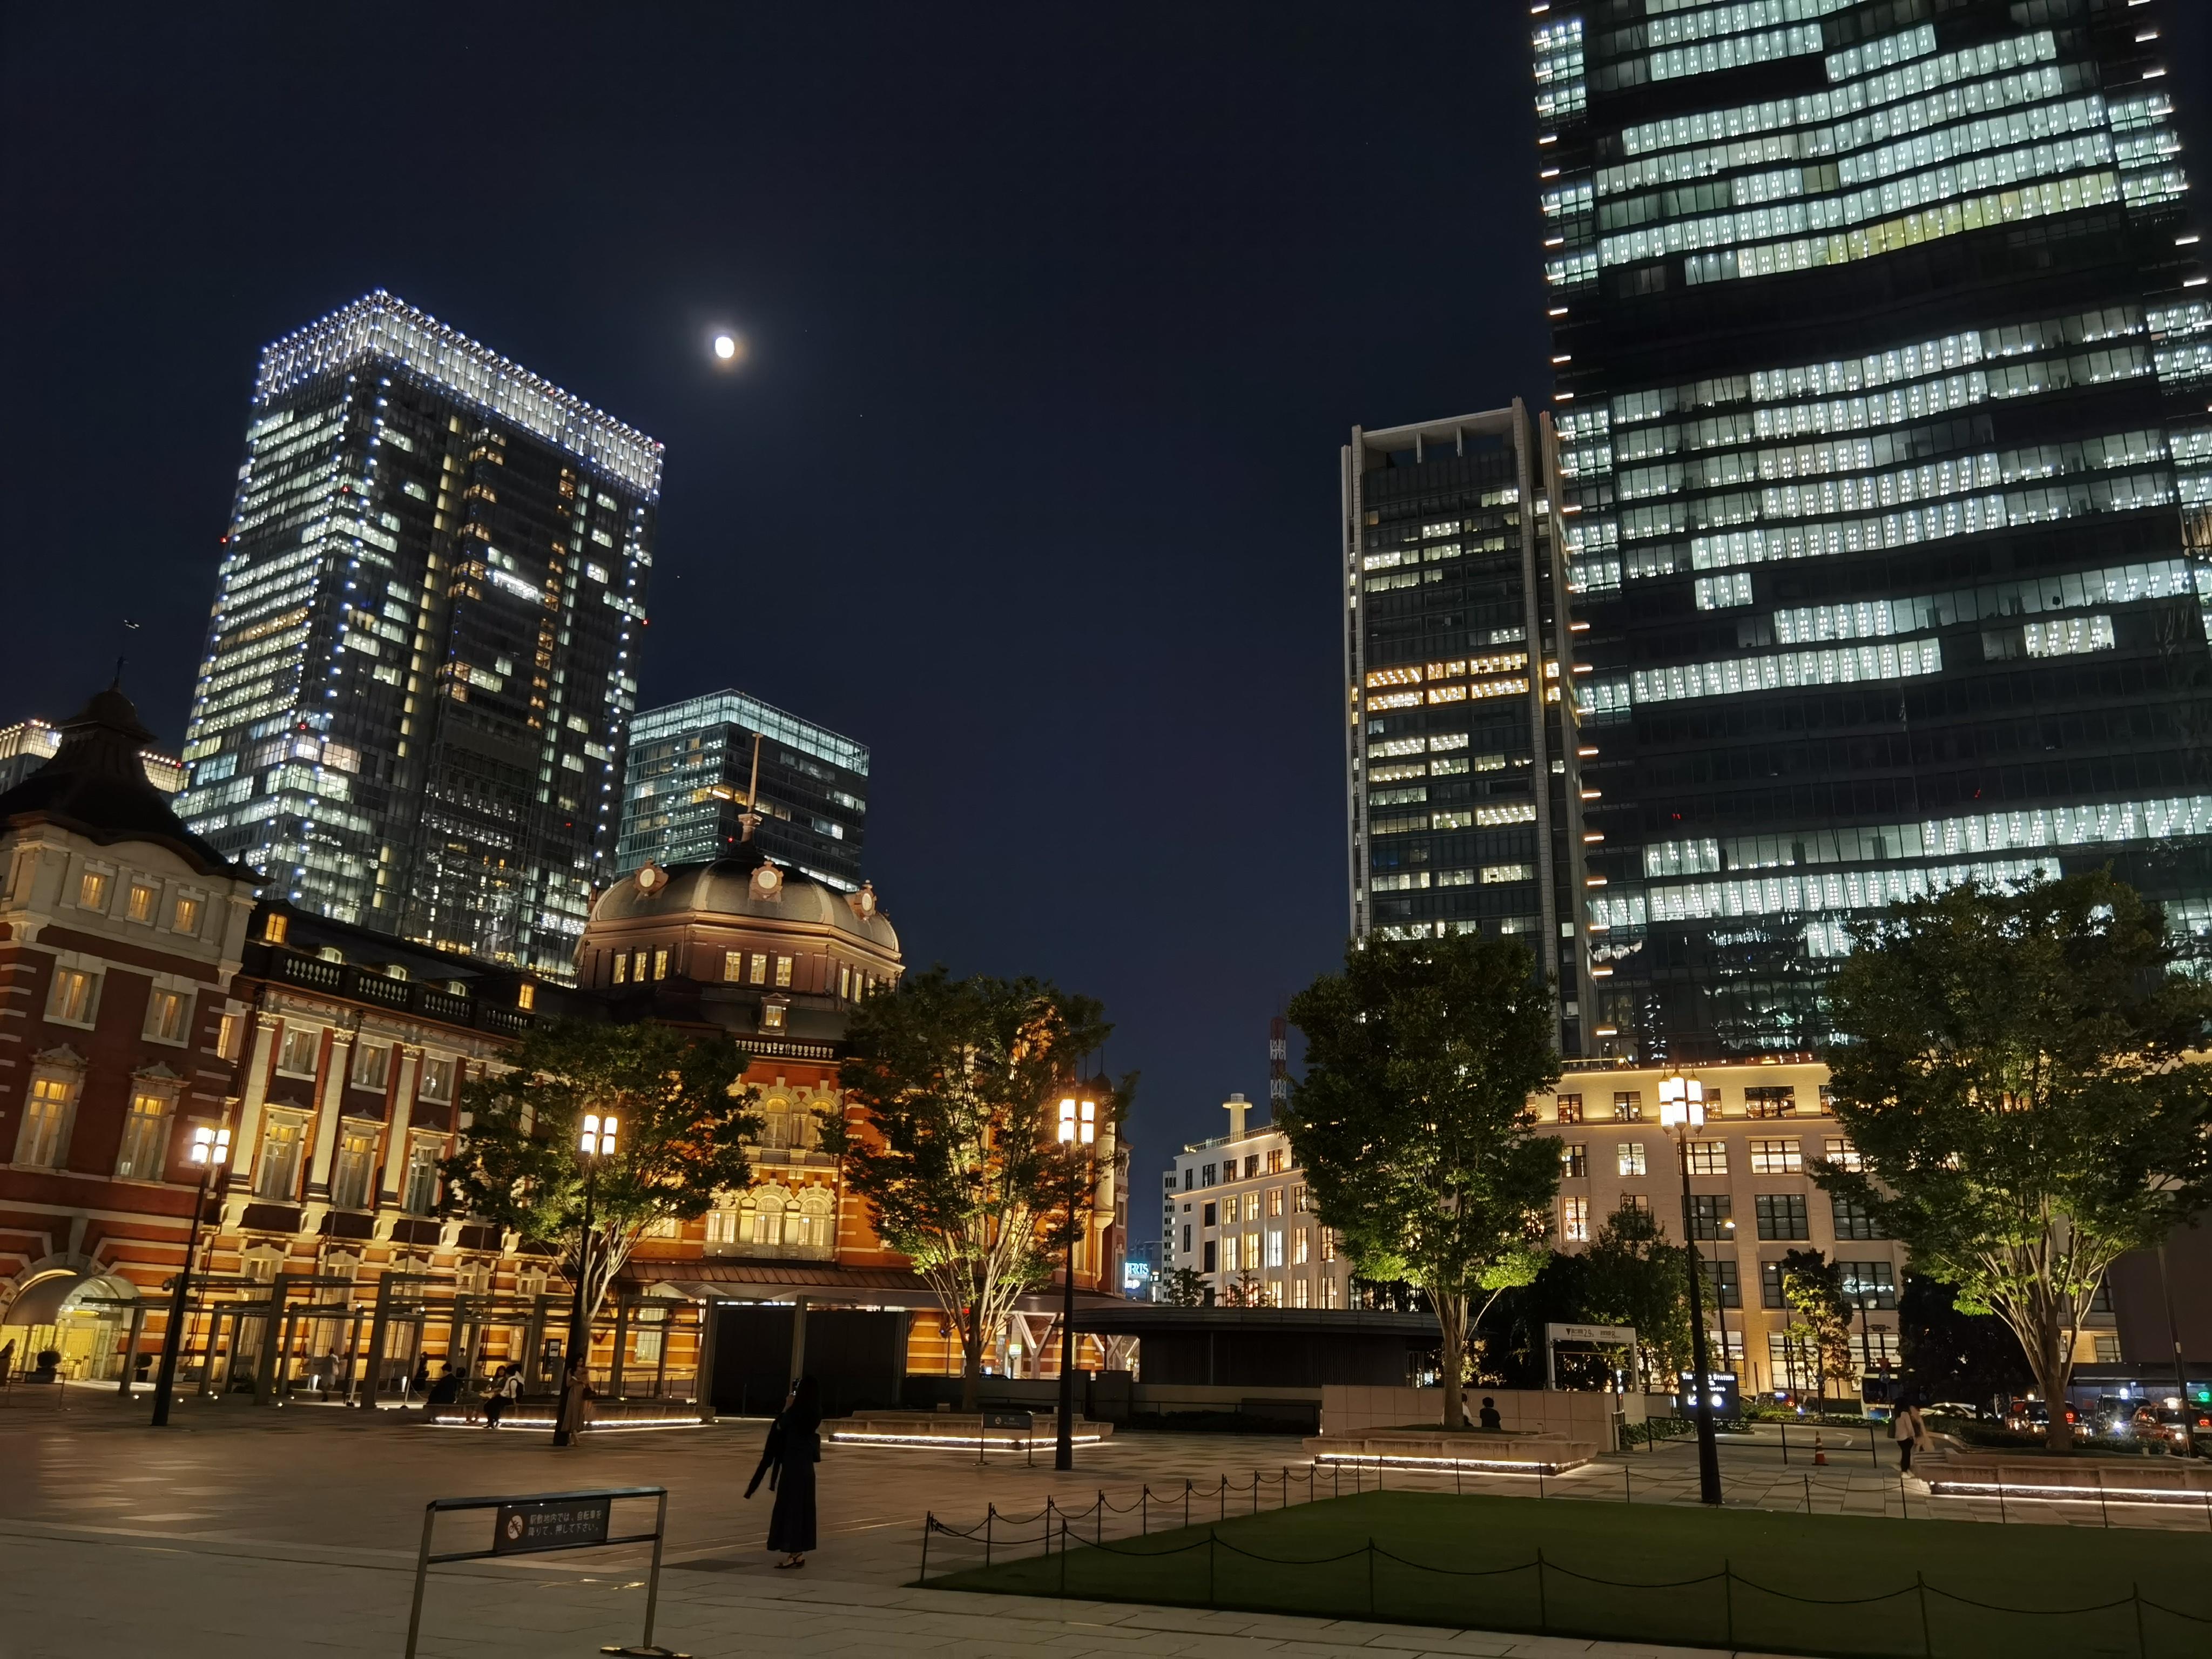 夜の東京駅 夜景カメラ